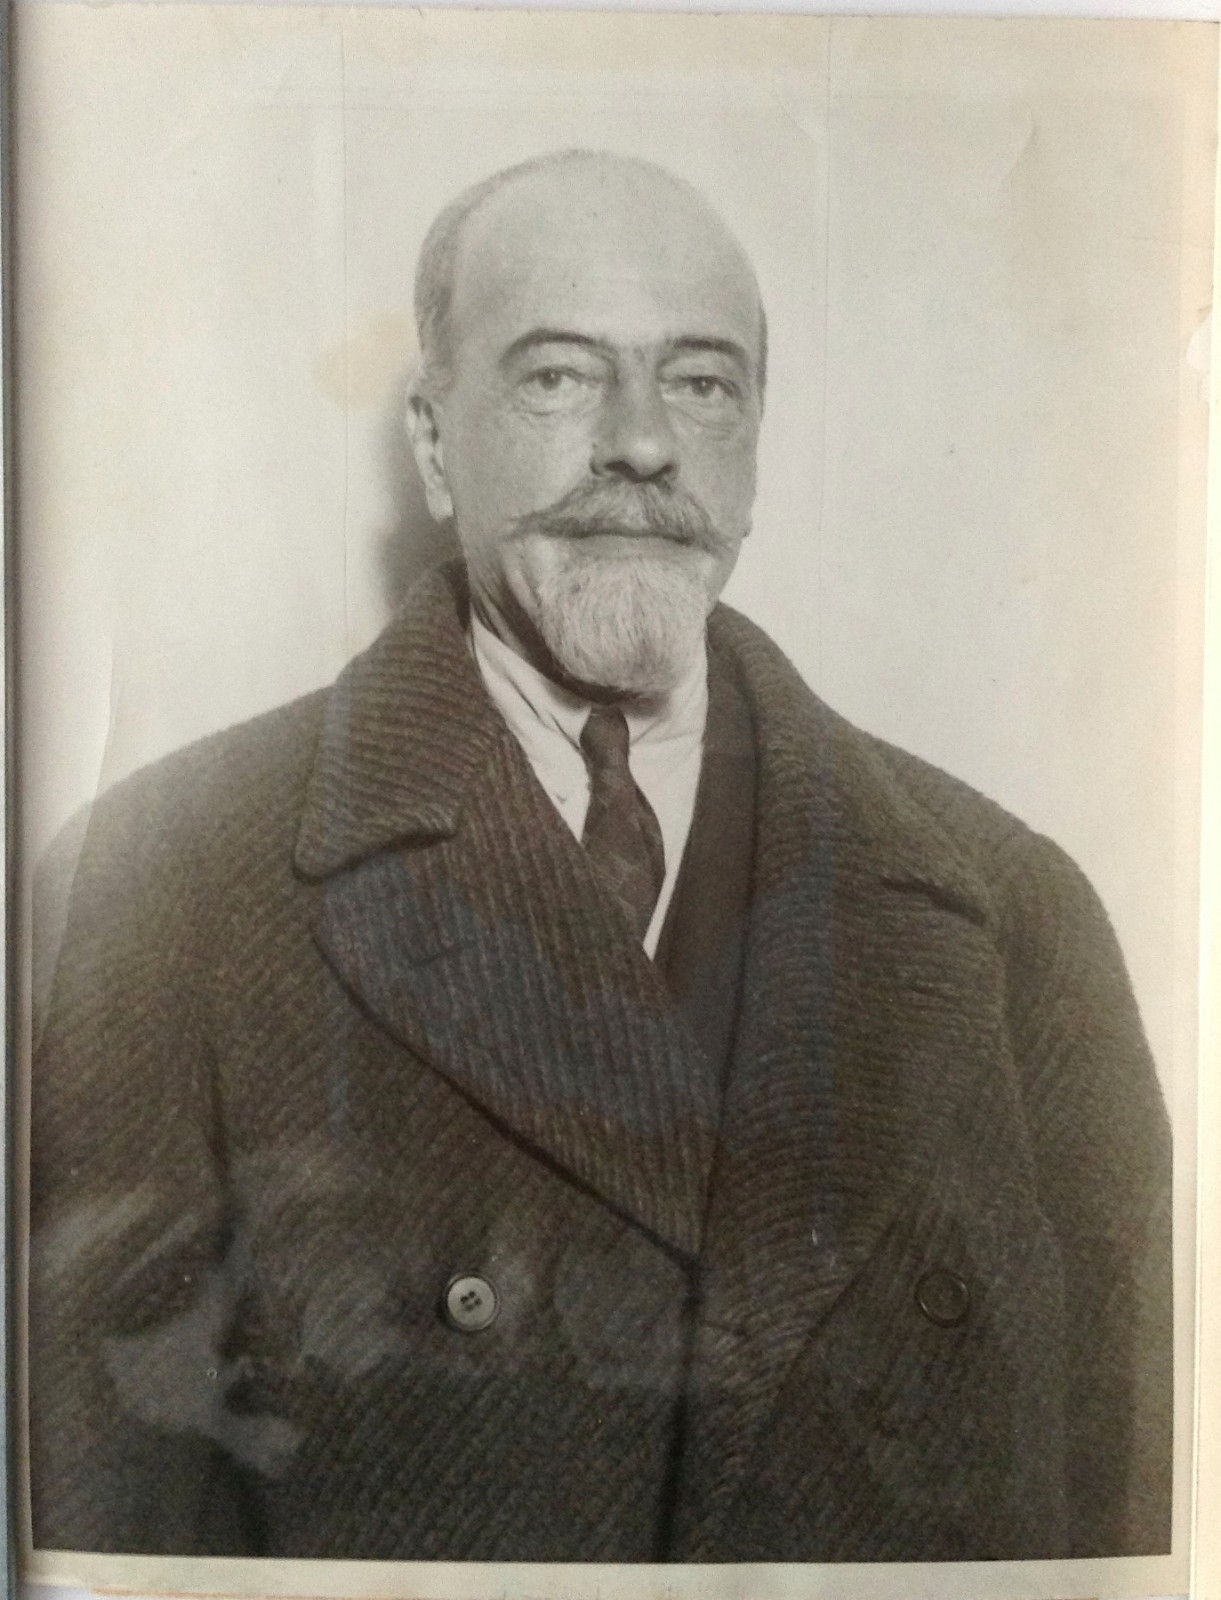 1920-е. Великий князь Александр Михайлович